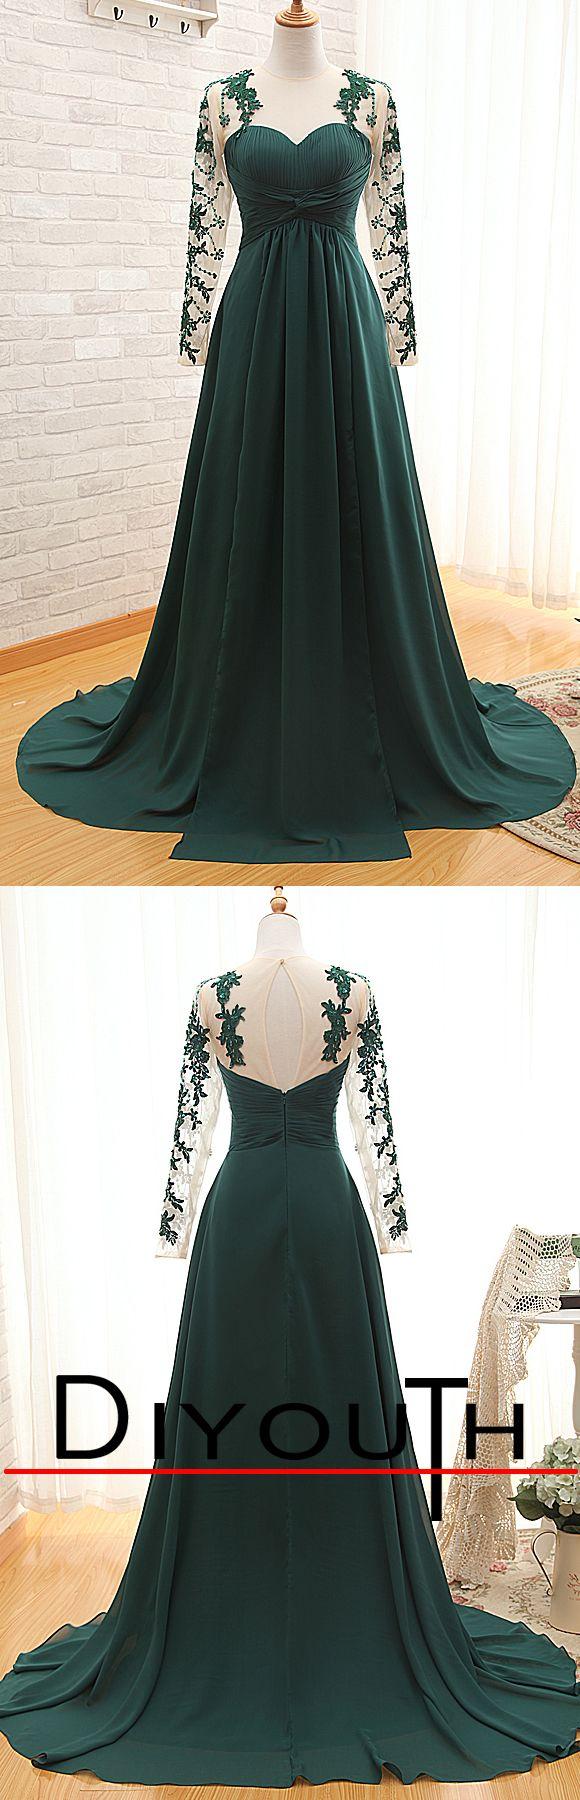 Long dark green dress  Paola Cerda a on Pinterest